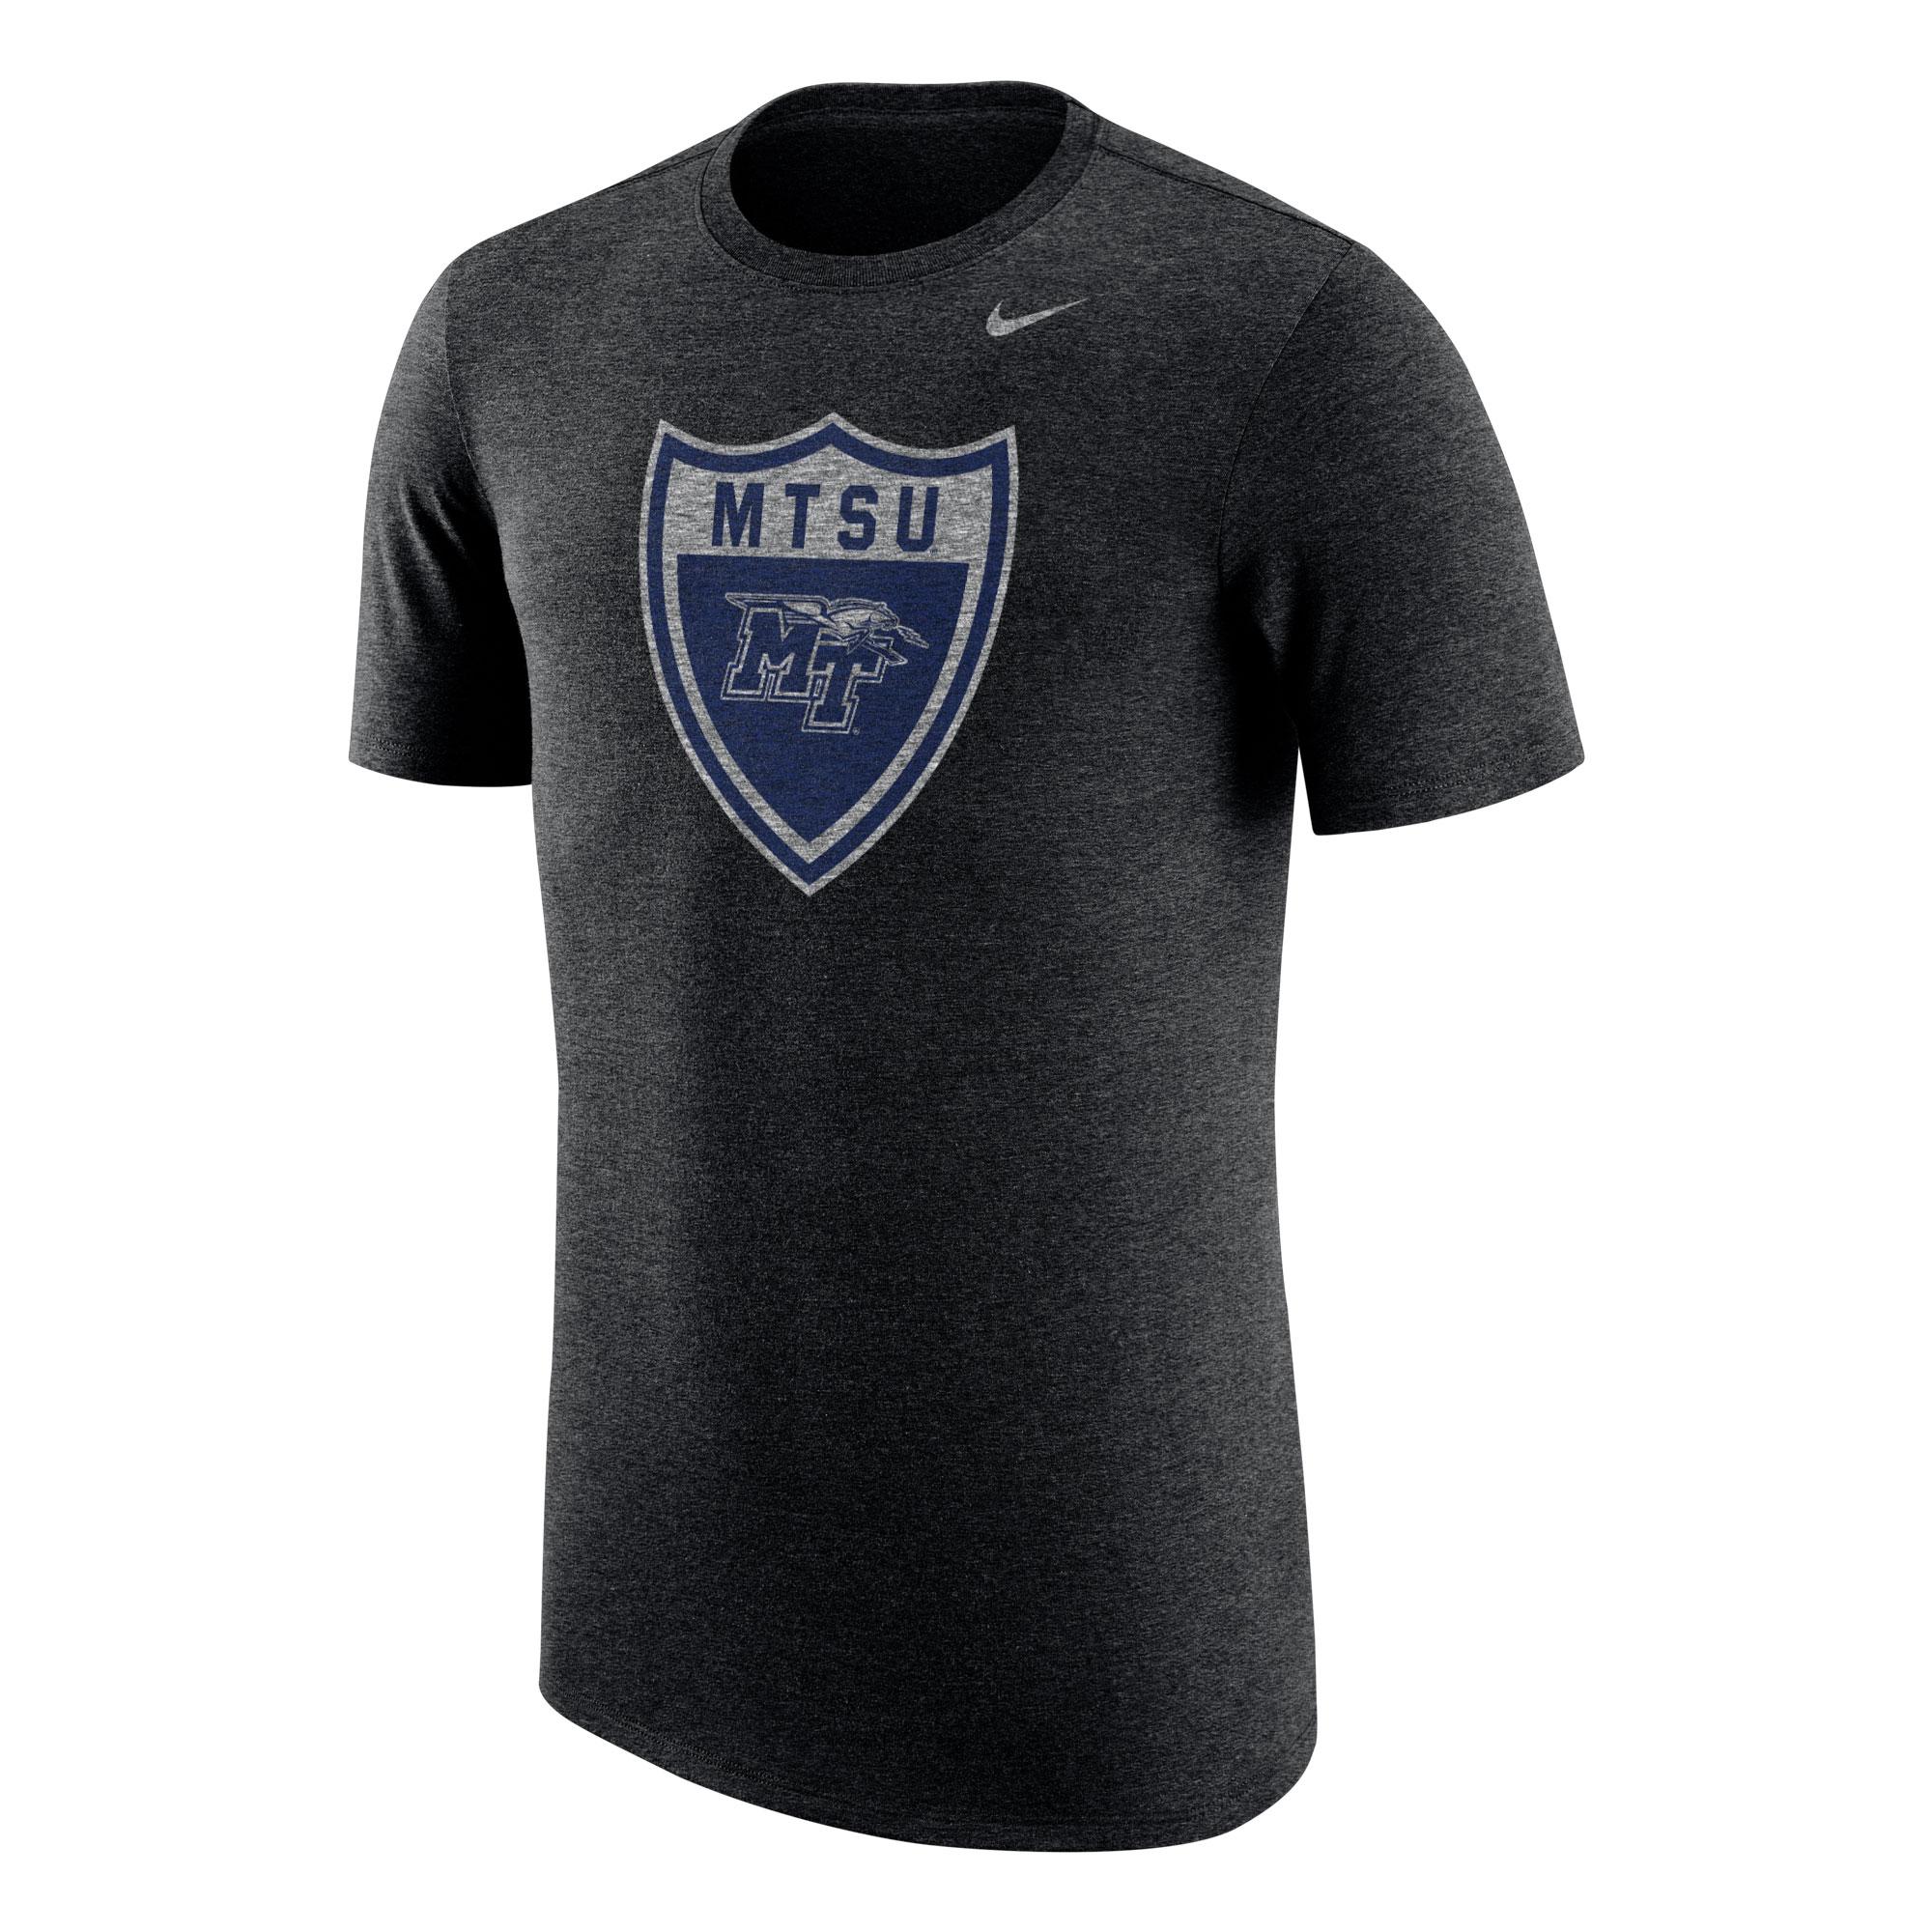 MT Logo w/ Lightning Shield Triblend Nike® Tshirt